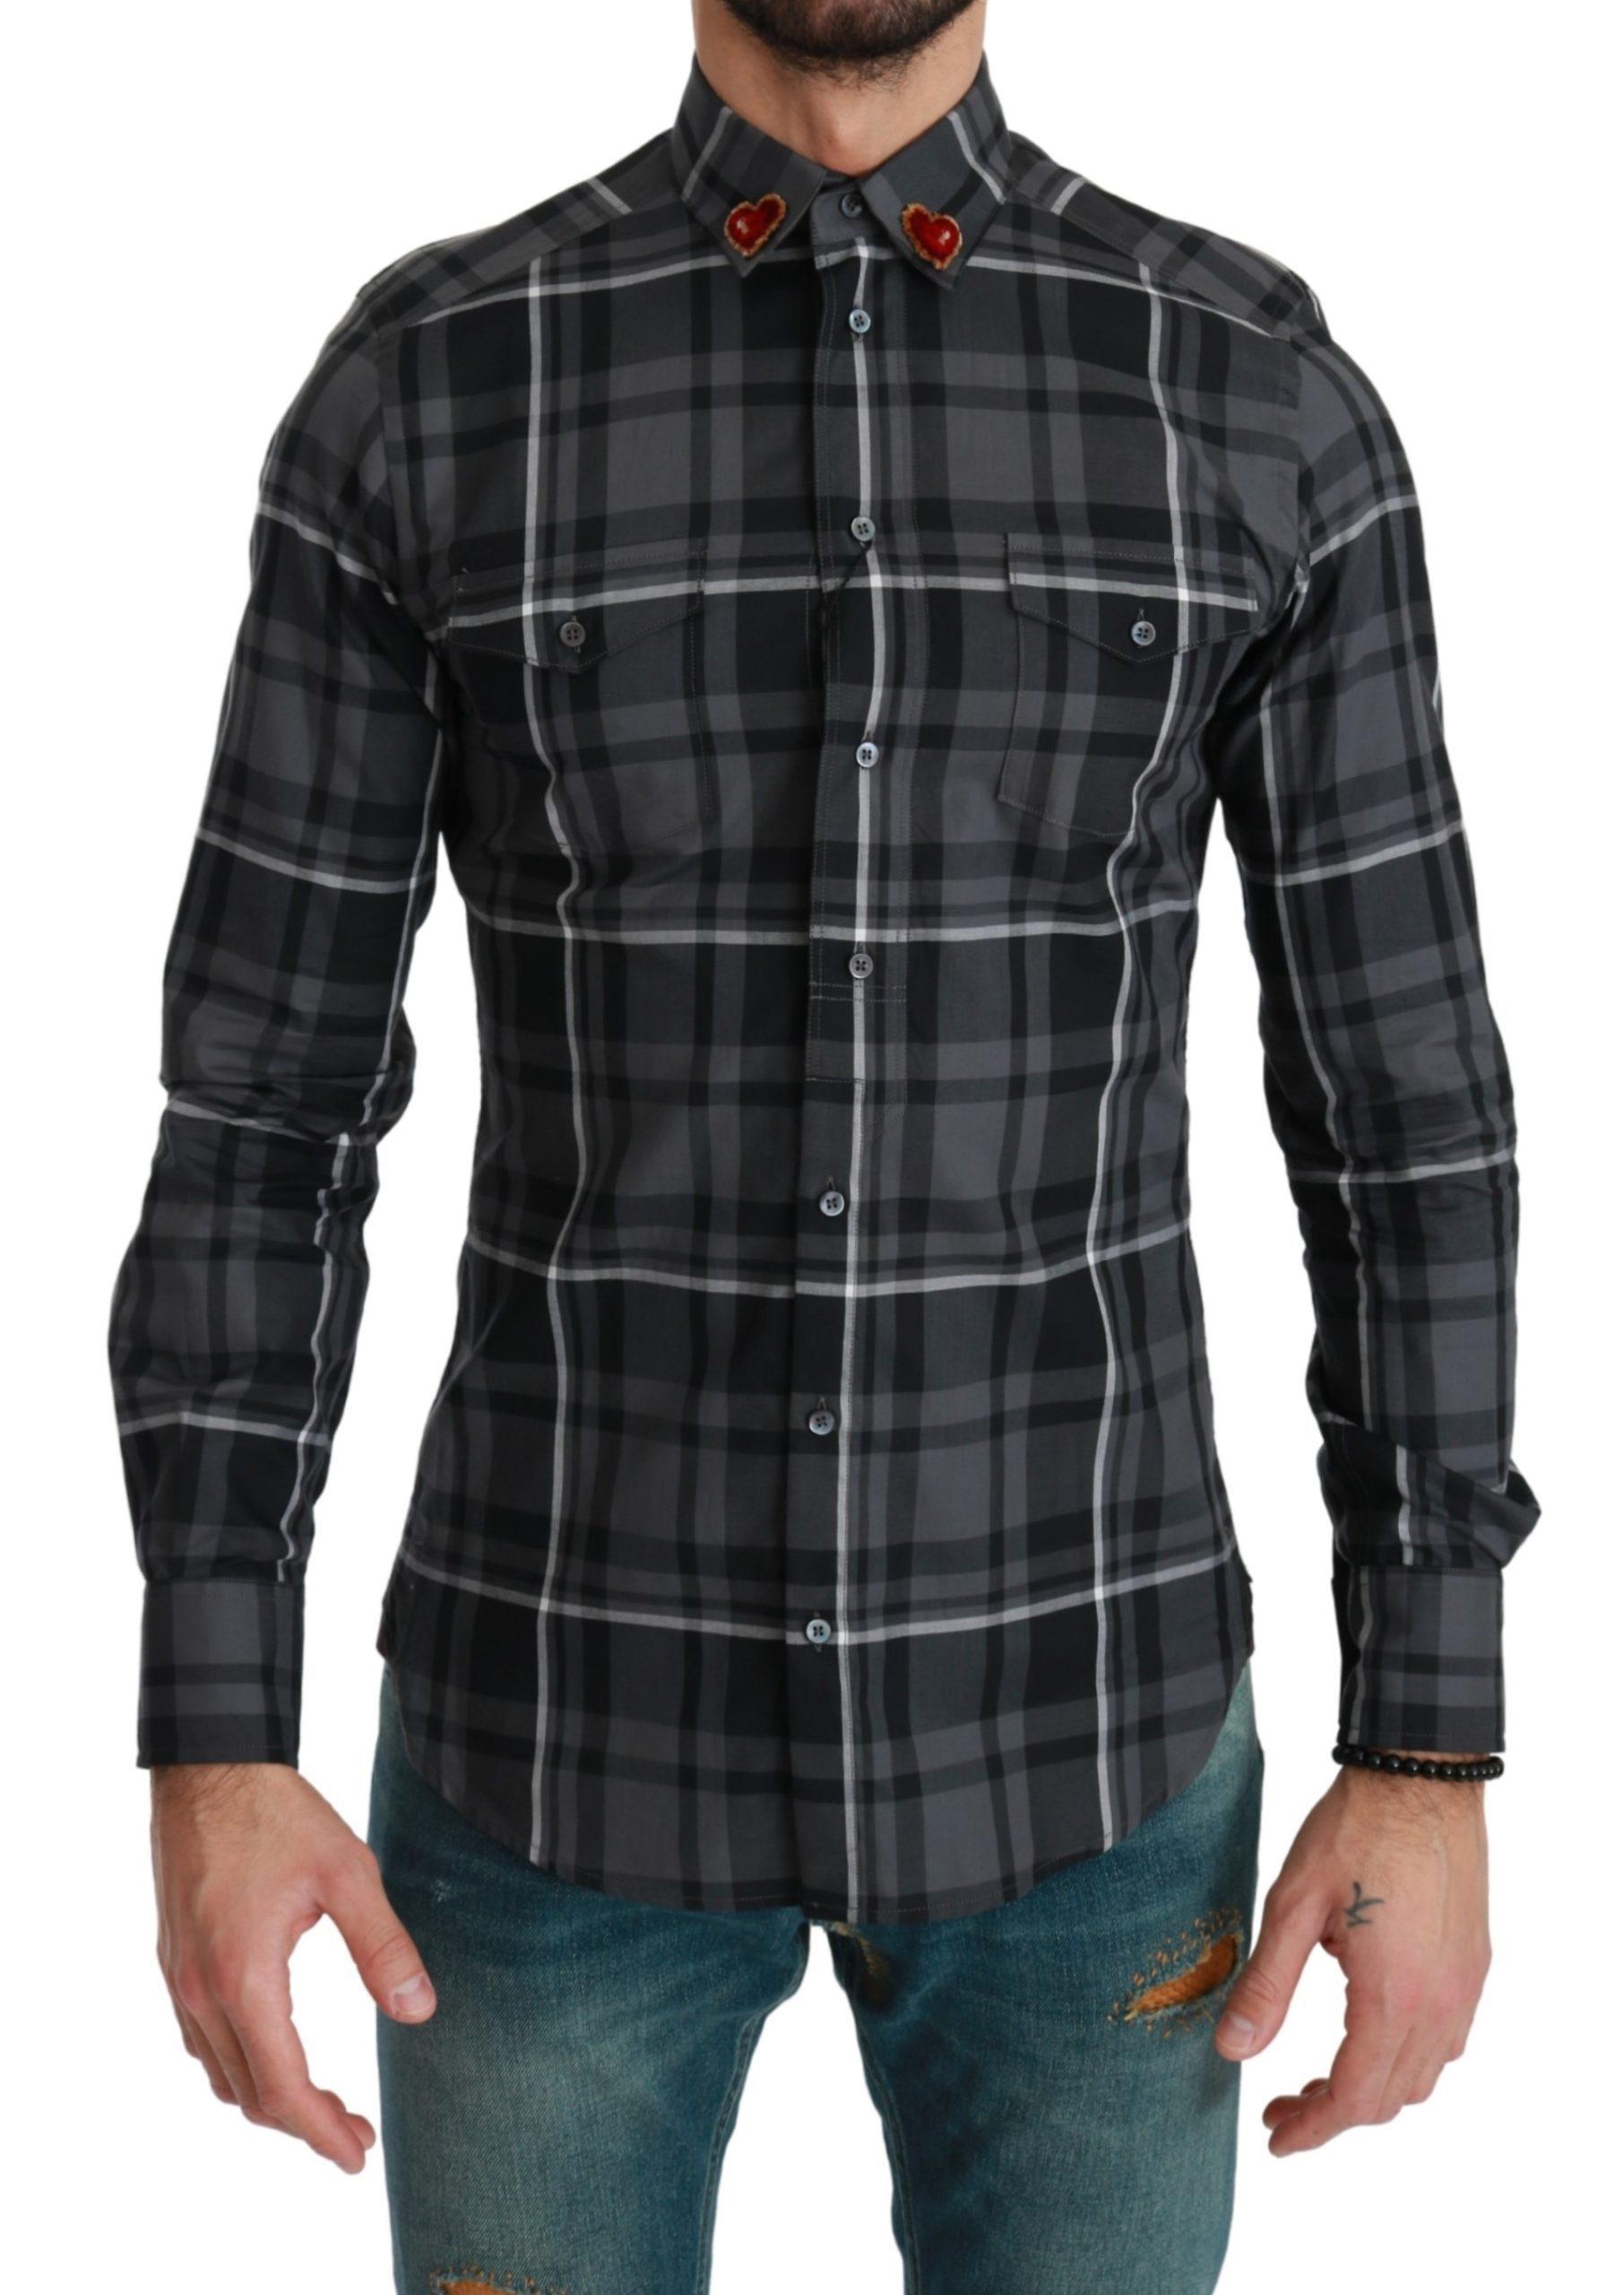 Dolce & Gabbana Men's Plaid Casual MARTINI Shirt Gray TSH4624 - IT37 | XS